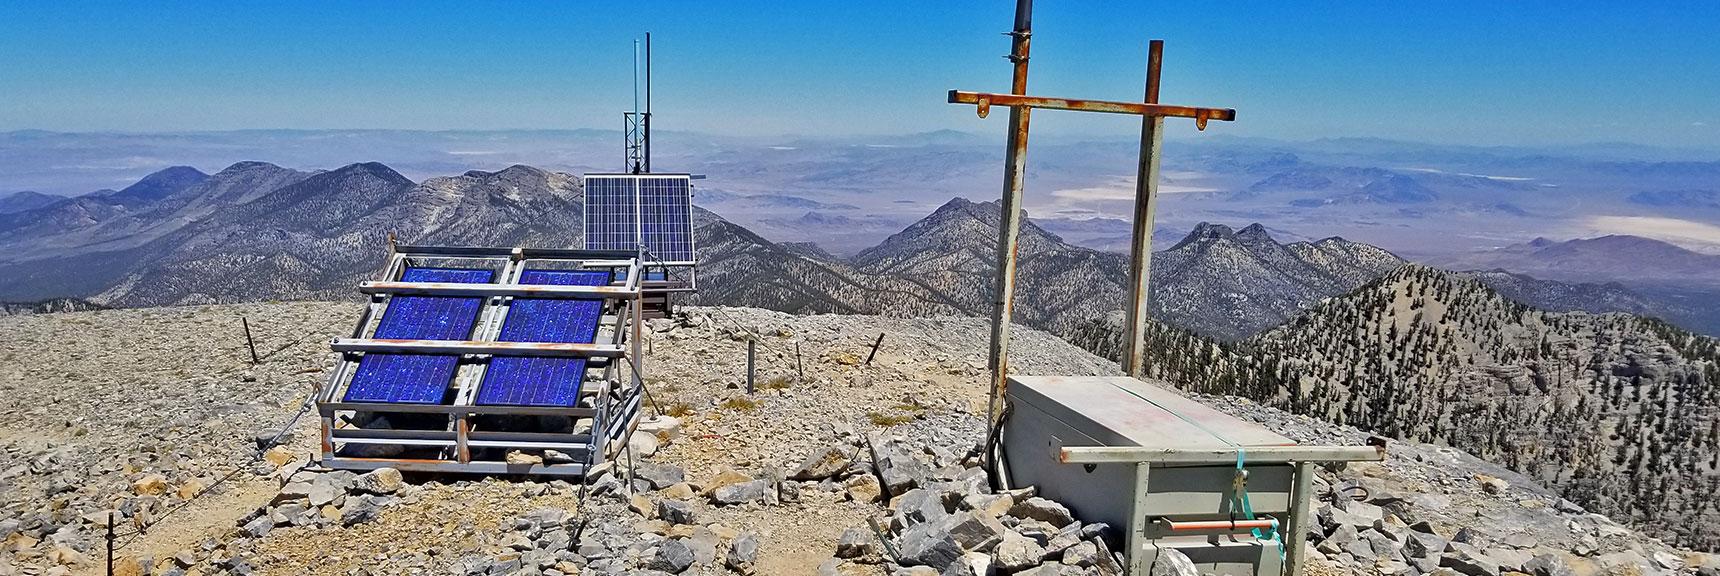 Weather Equipment on Charleston Peak Summit | Griffith Peak & Charleston Peak Circuit Run, Spring Mountains, Nevada